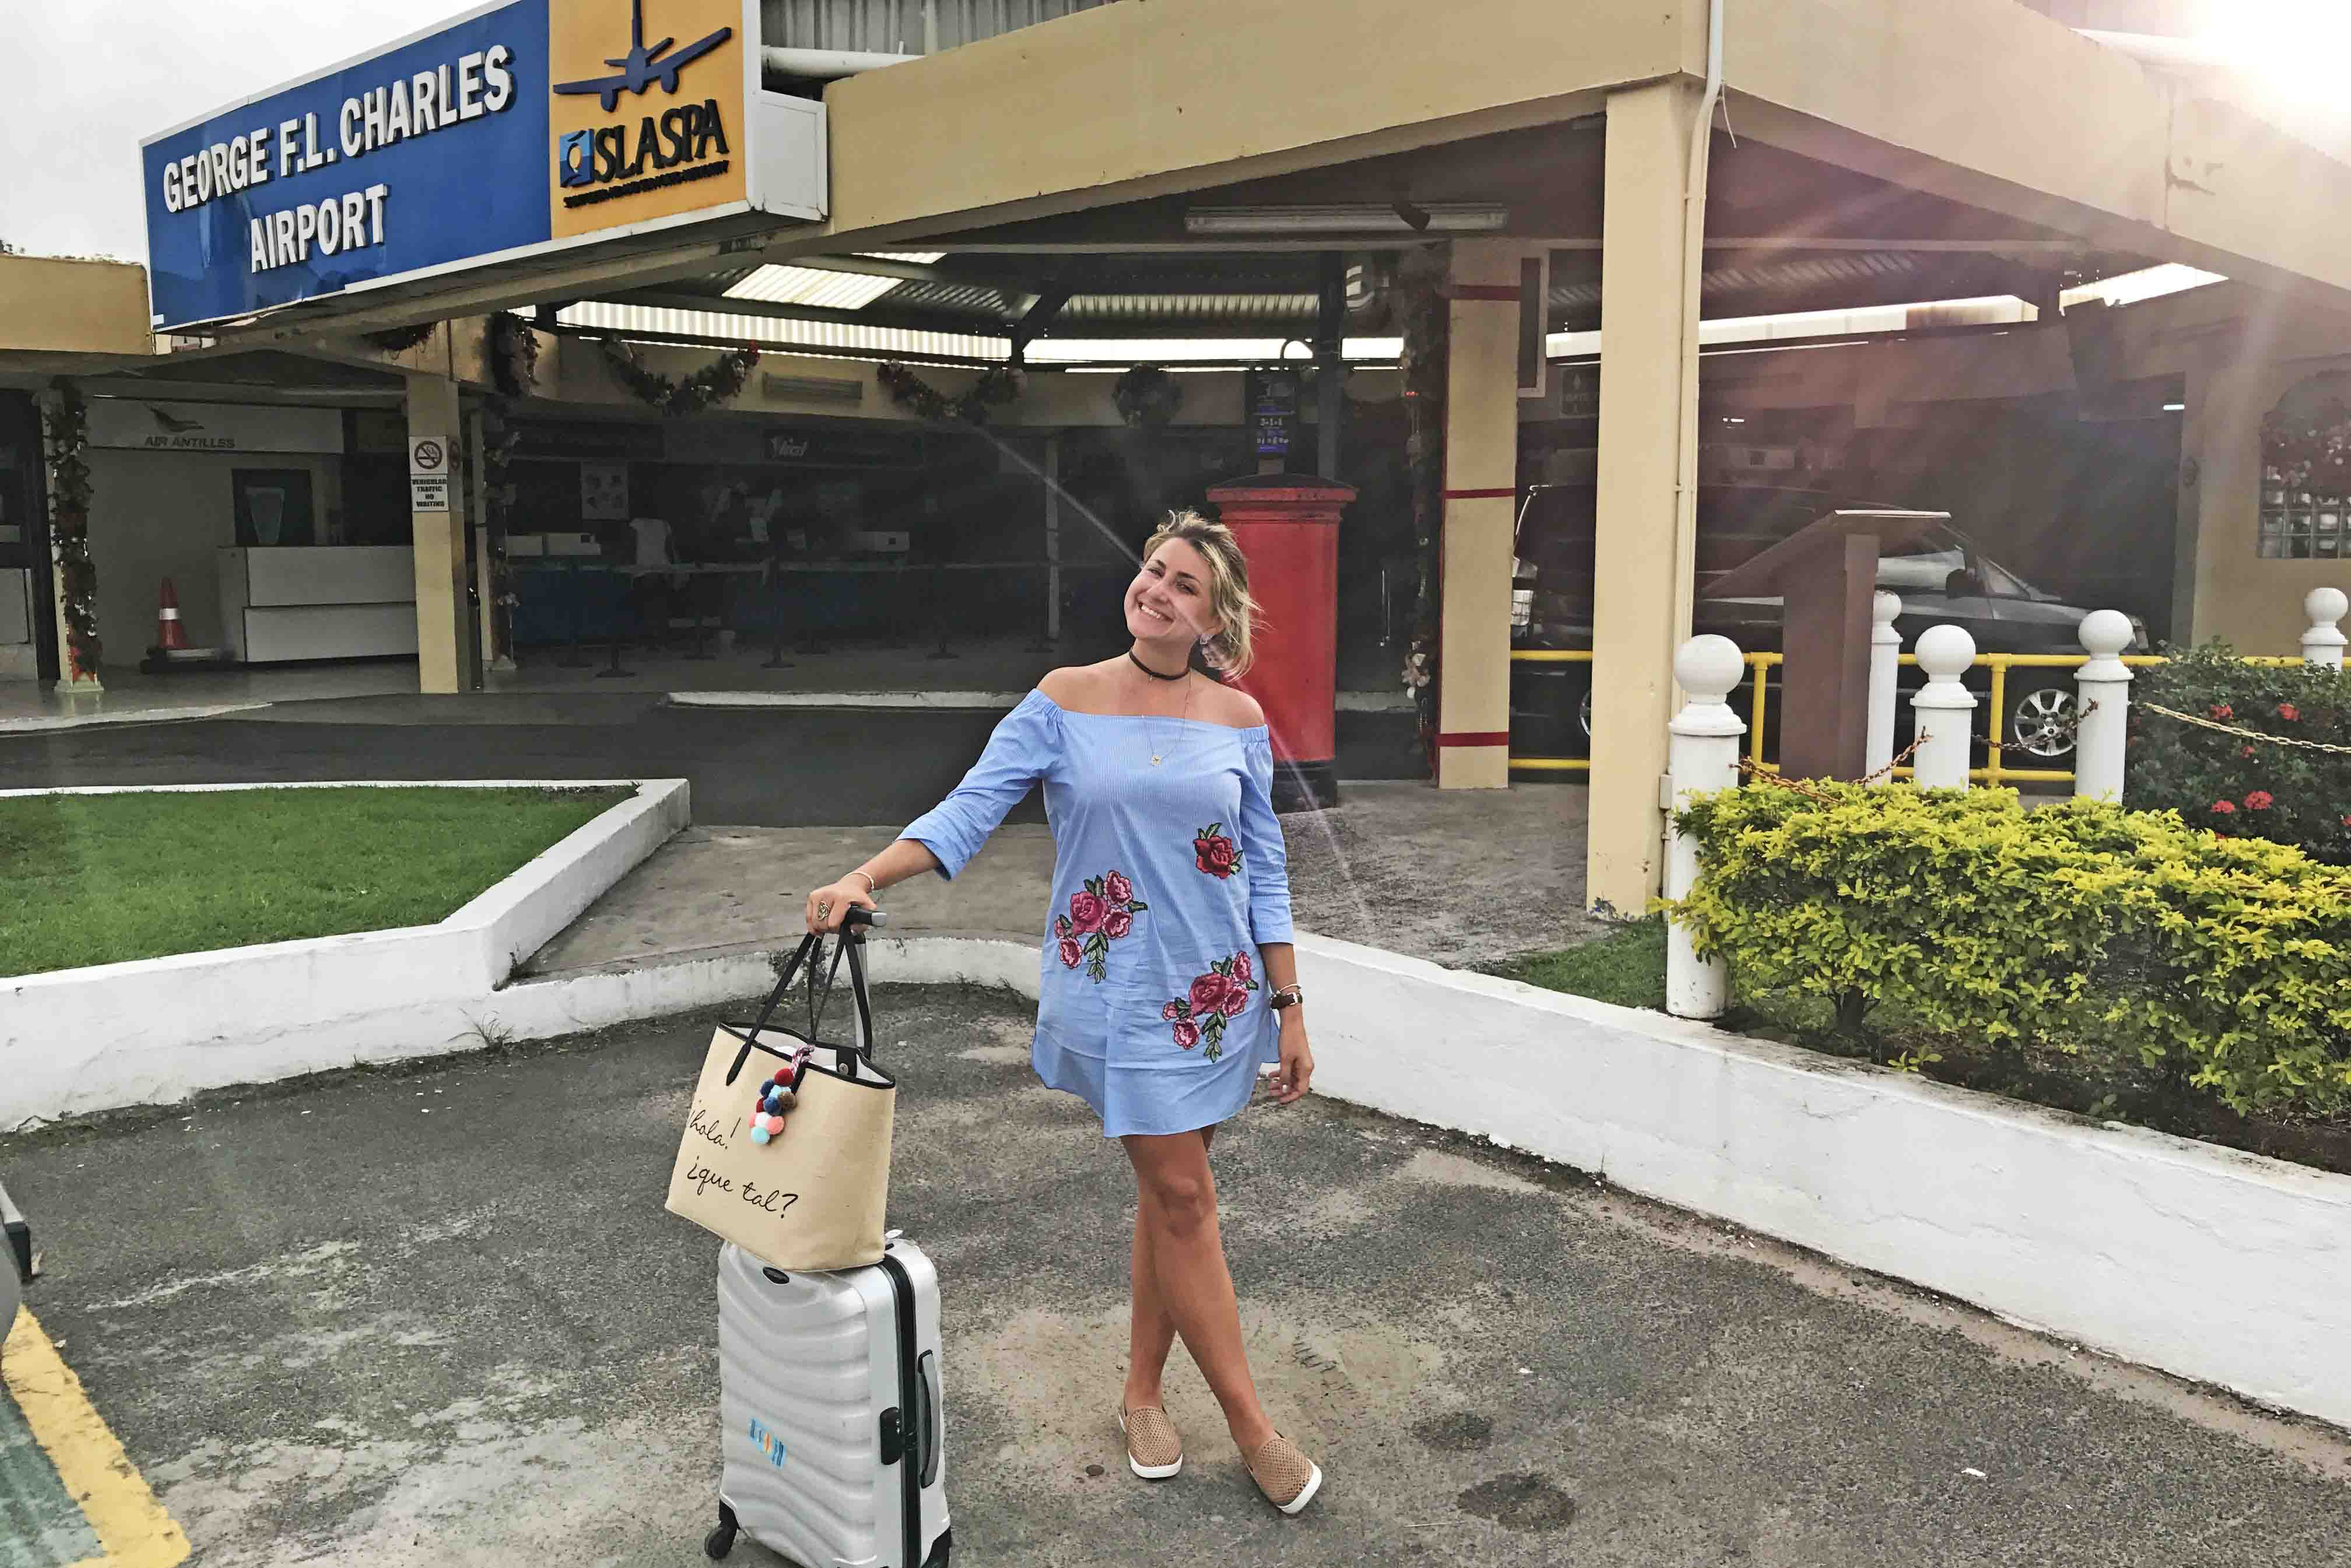 Aeroporto SLU em Saint Lucia - o menorzinho | foto: Lala Rebelo